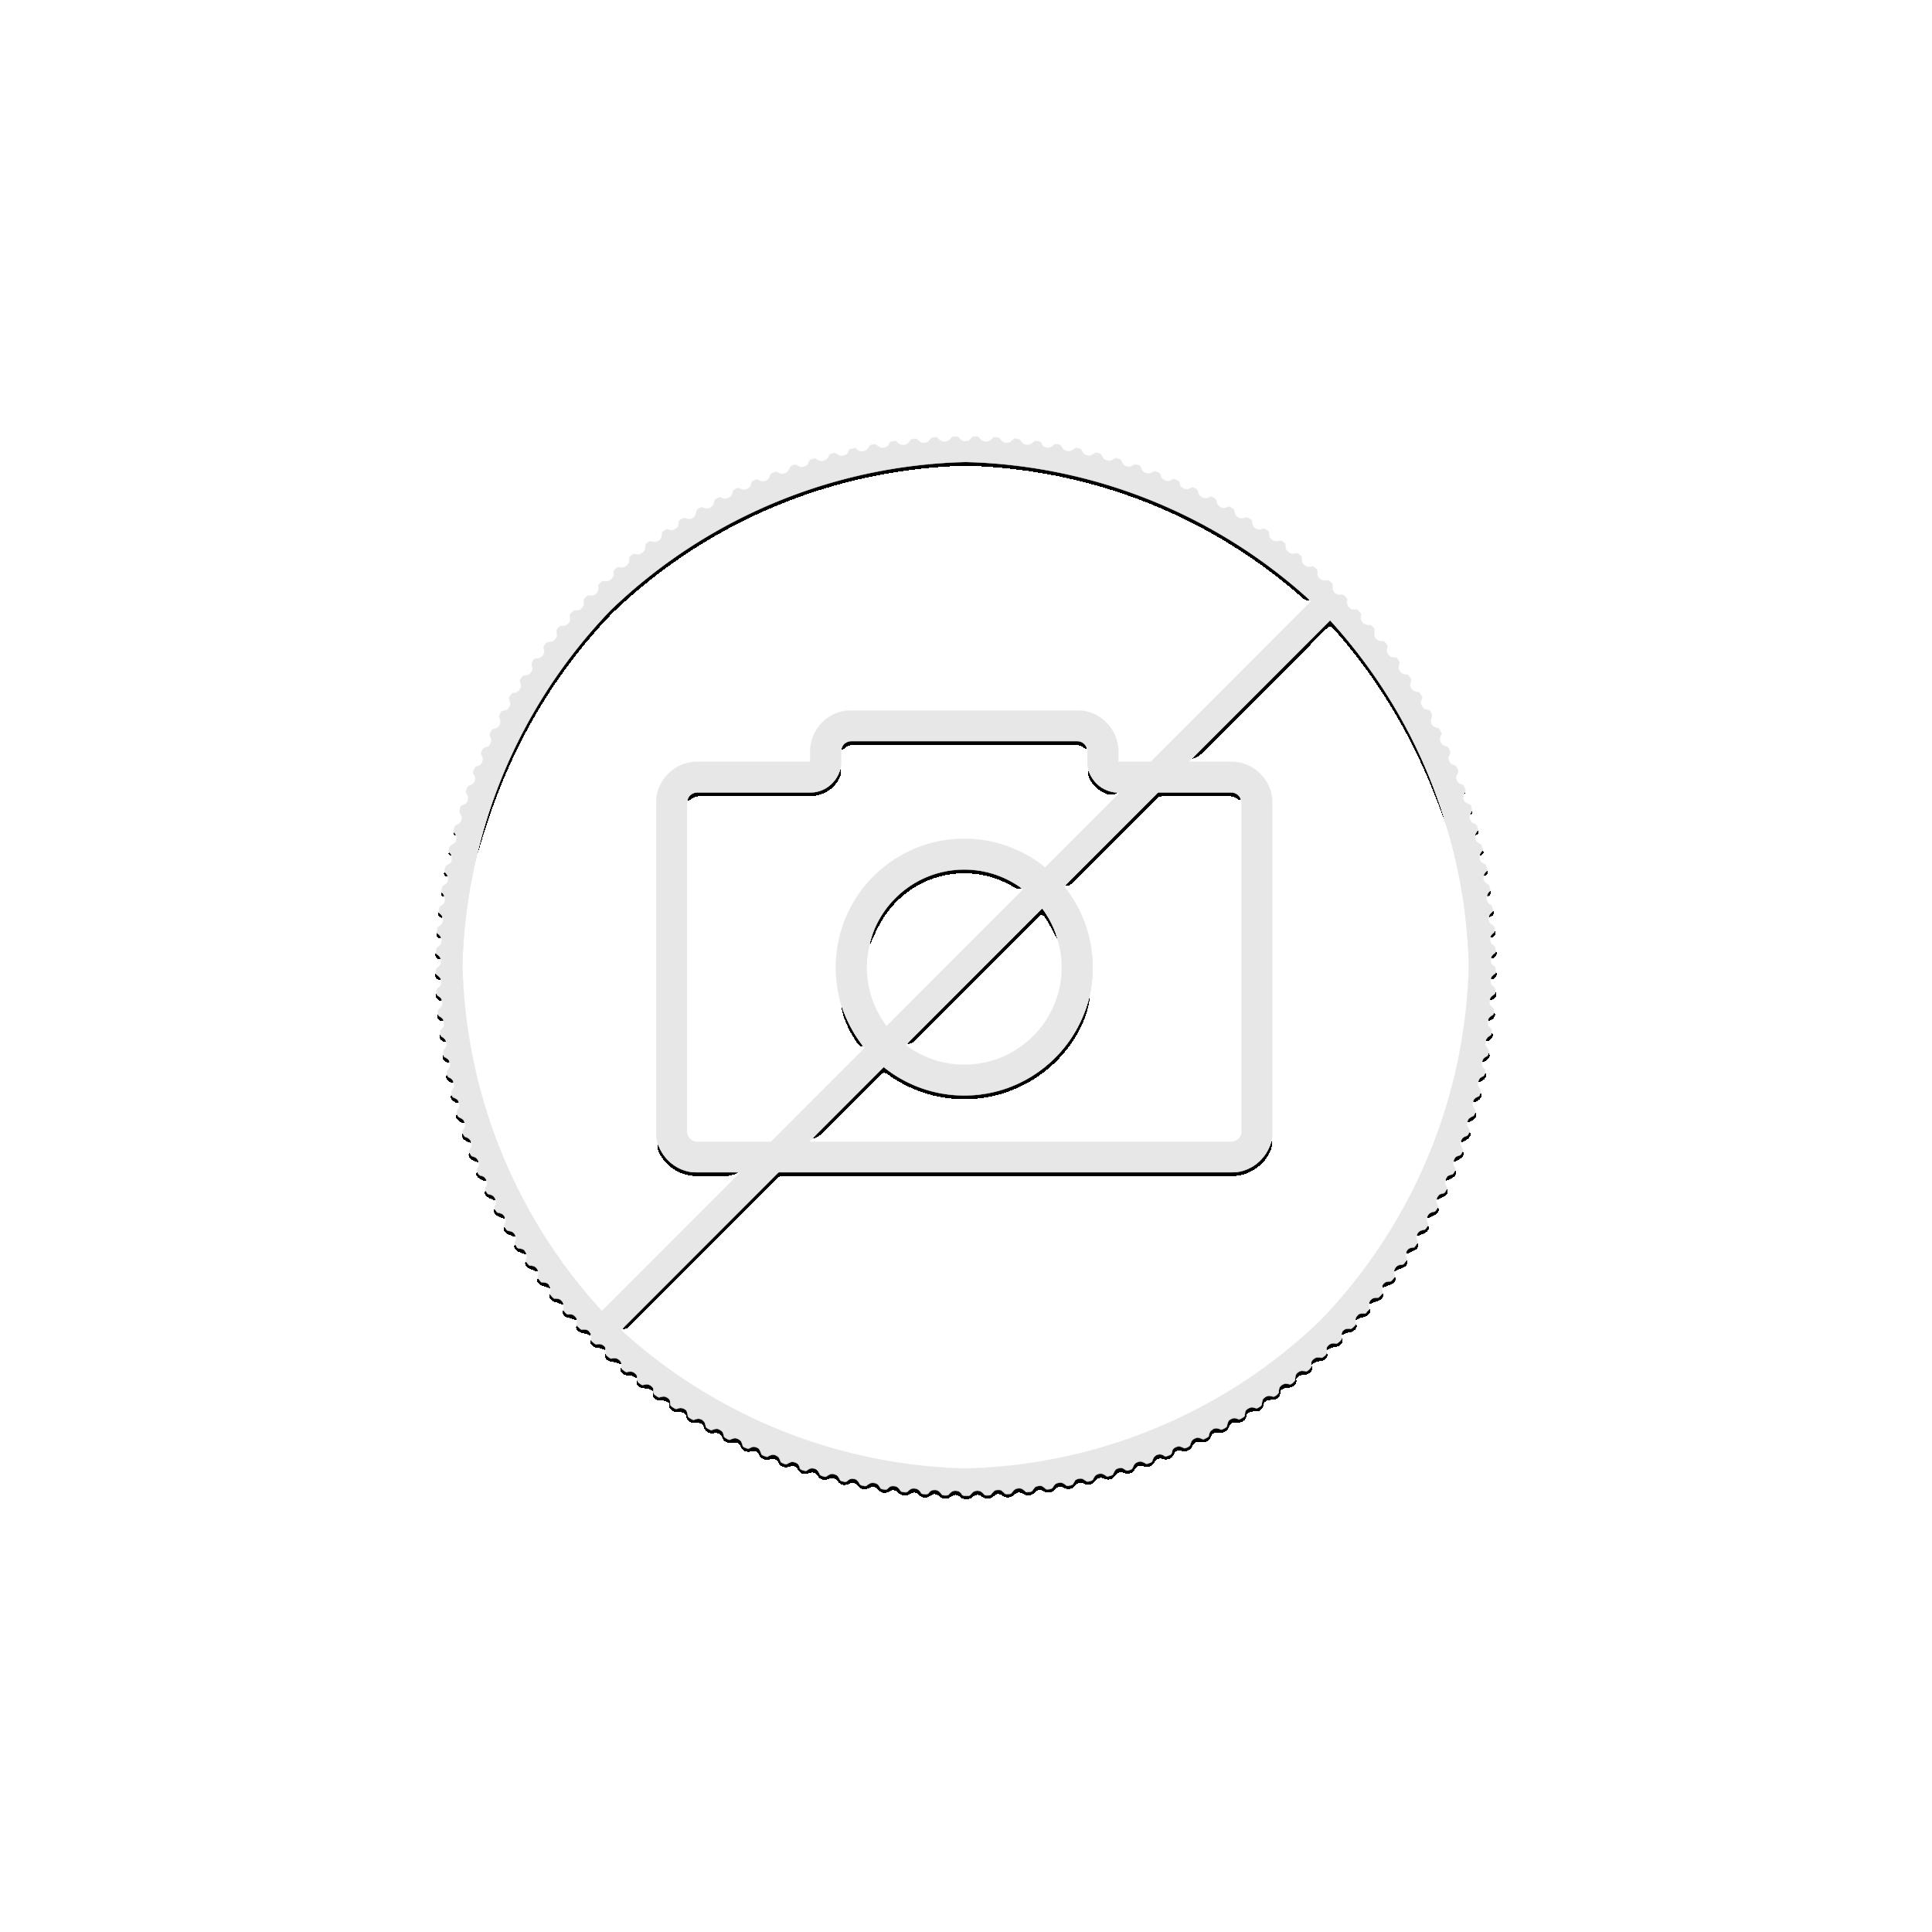 3 Gram gold coin Panda 2020